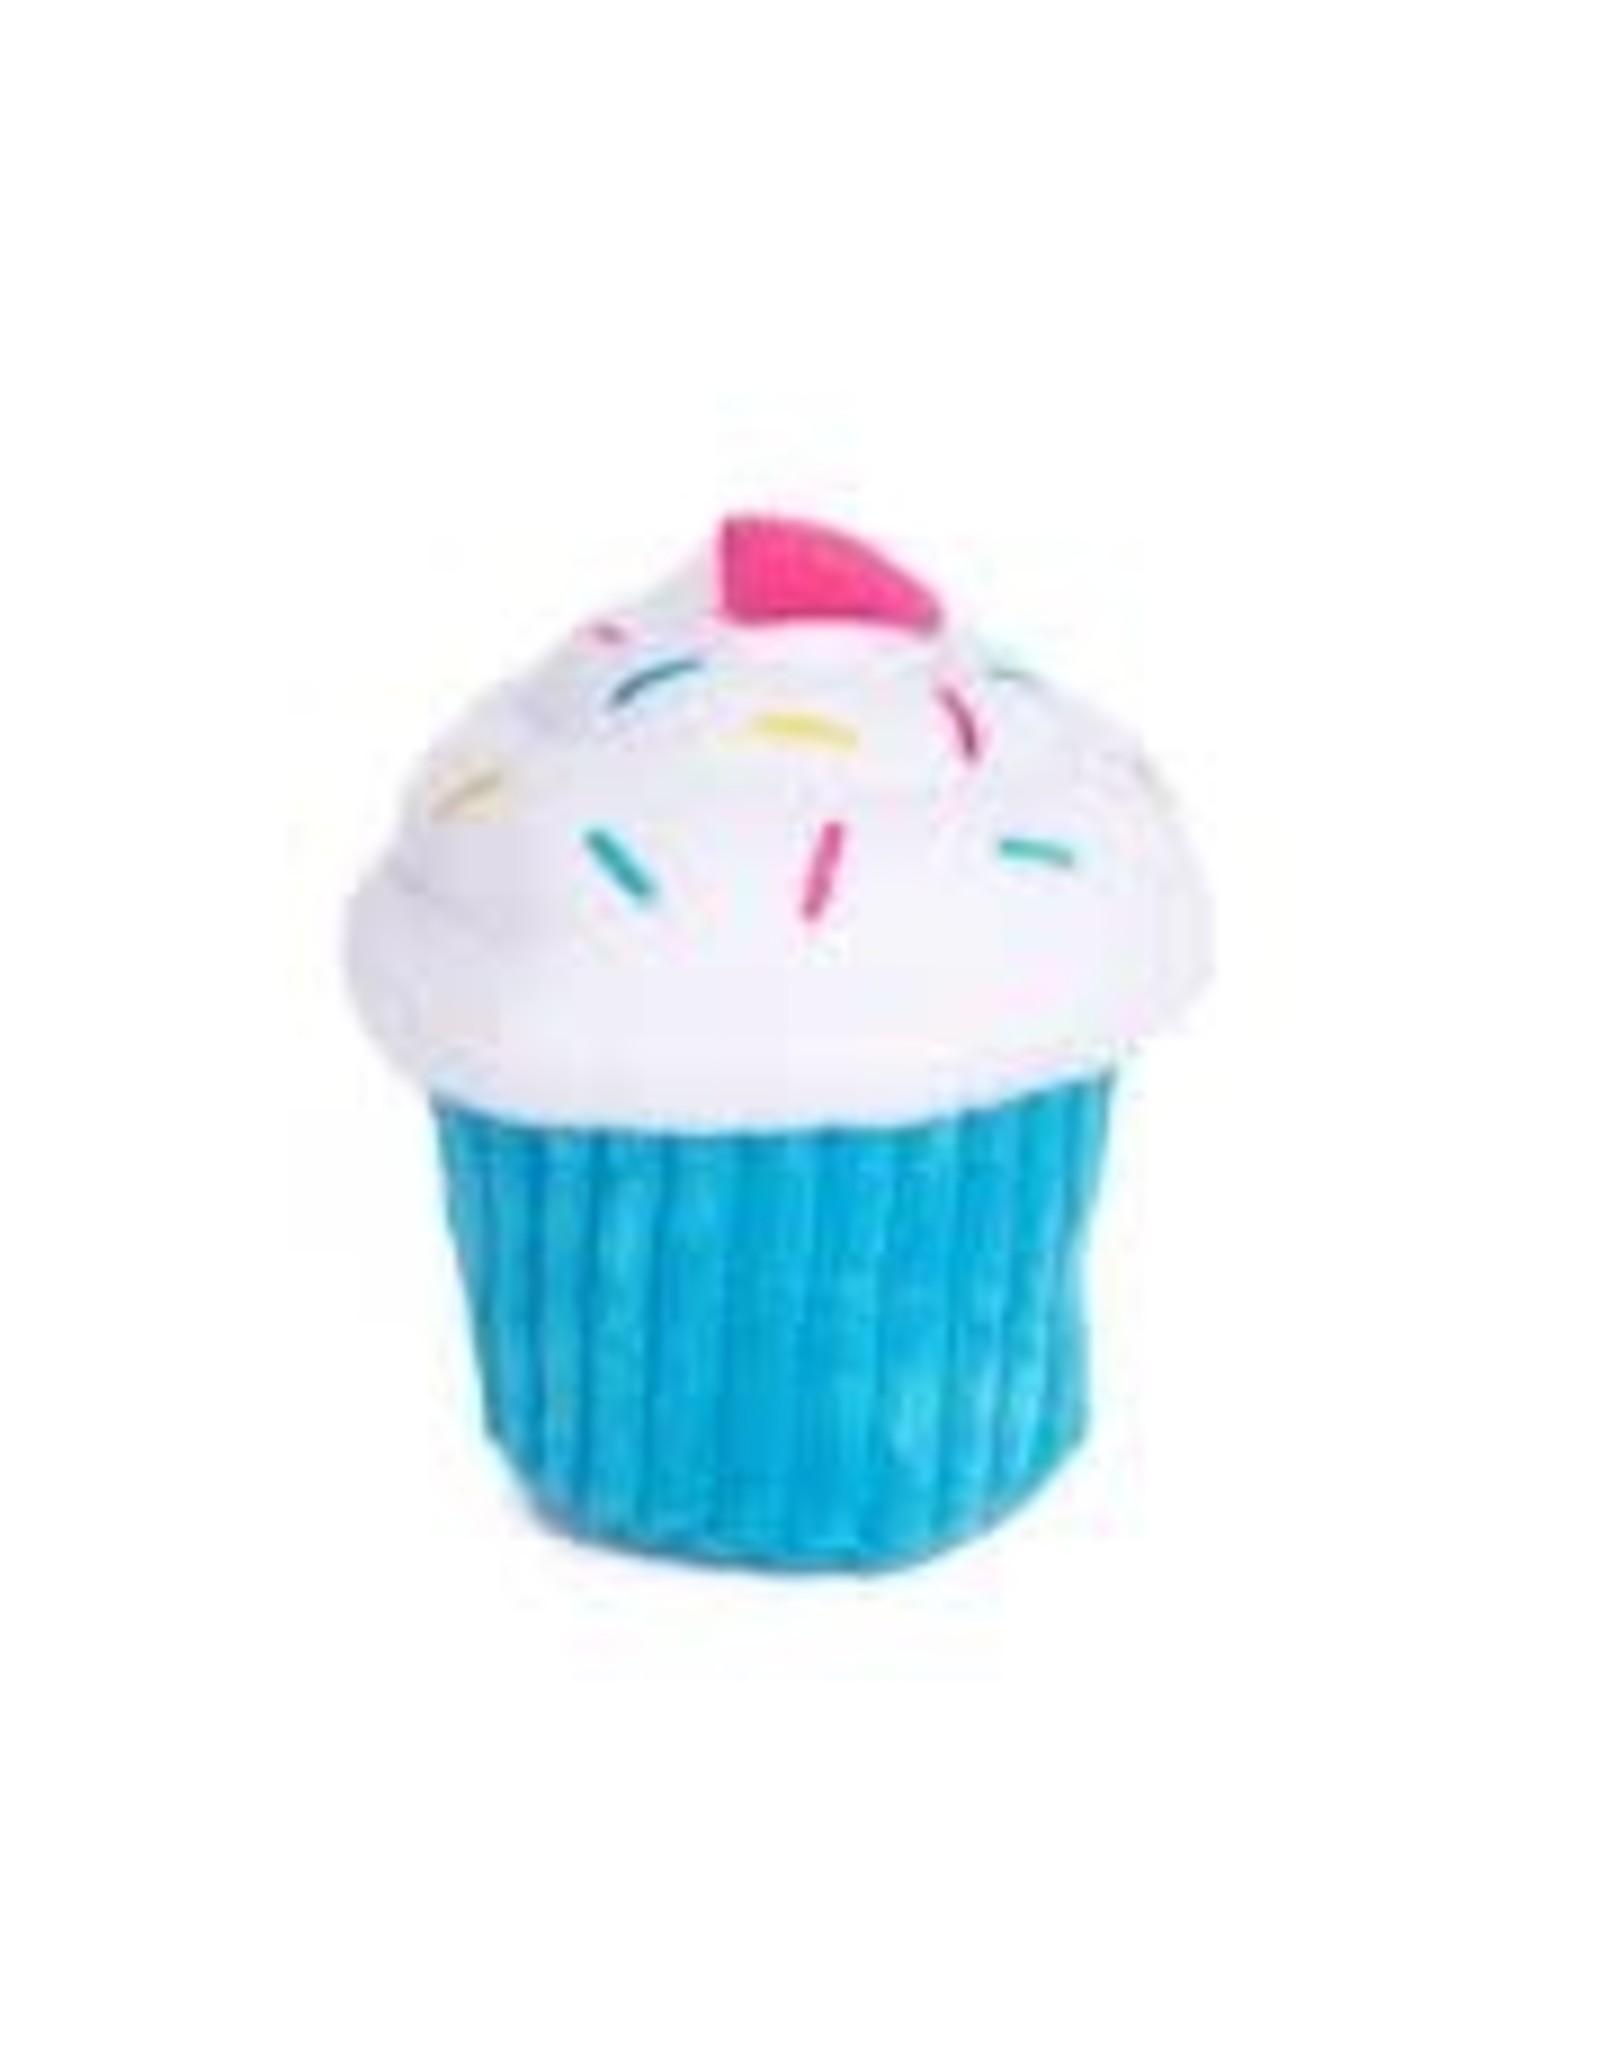 Zippy Paws Zippy Paws Cupcake Blue